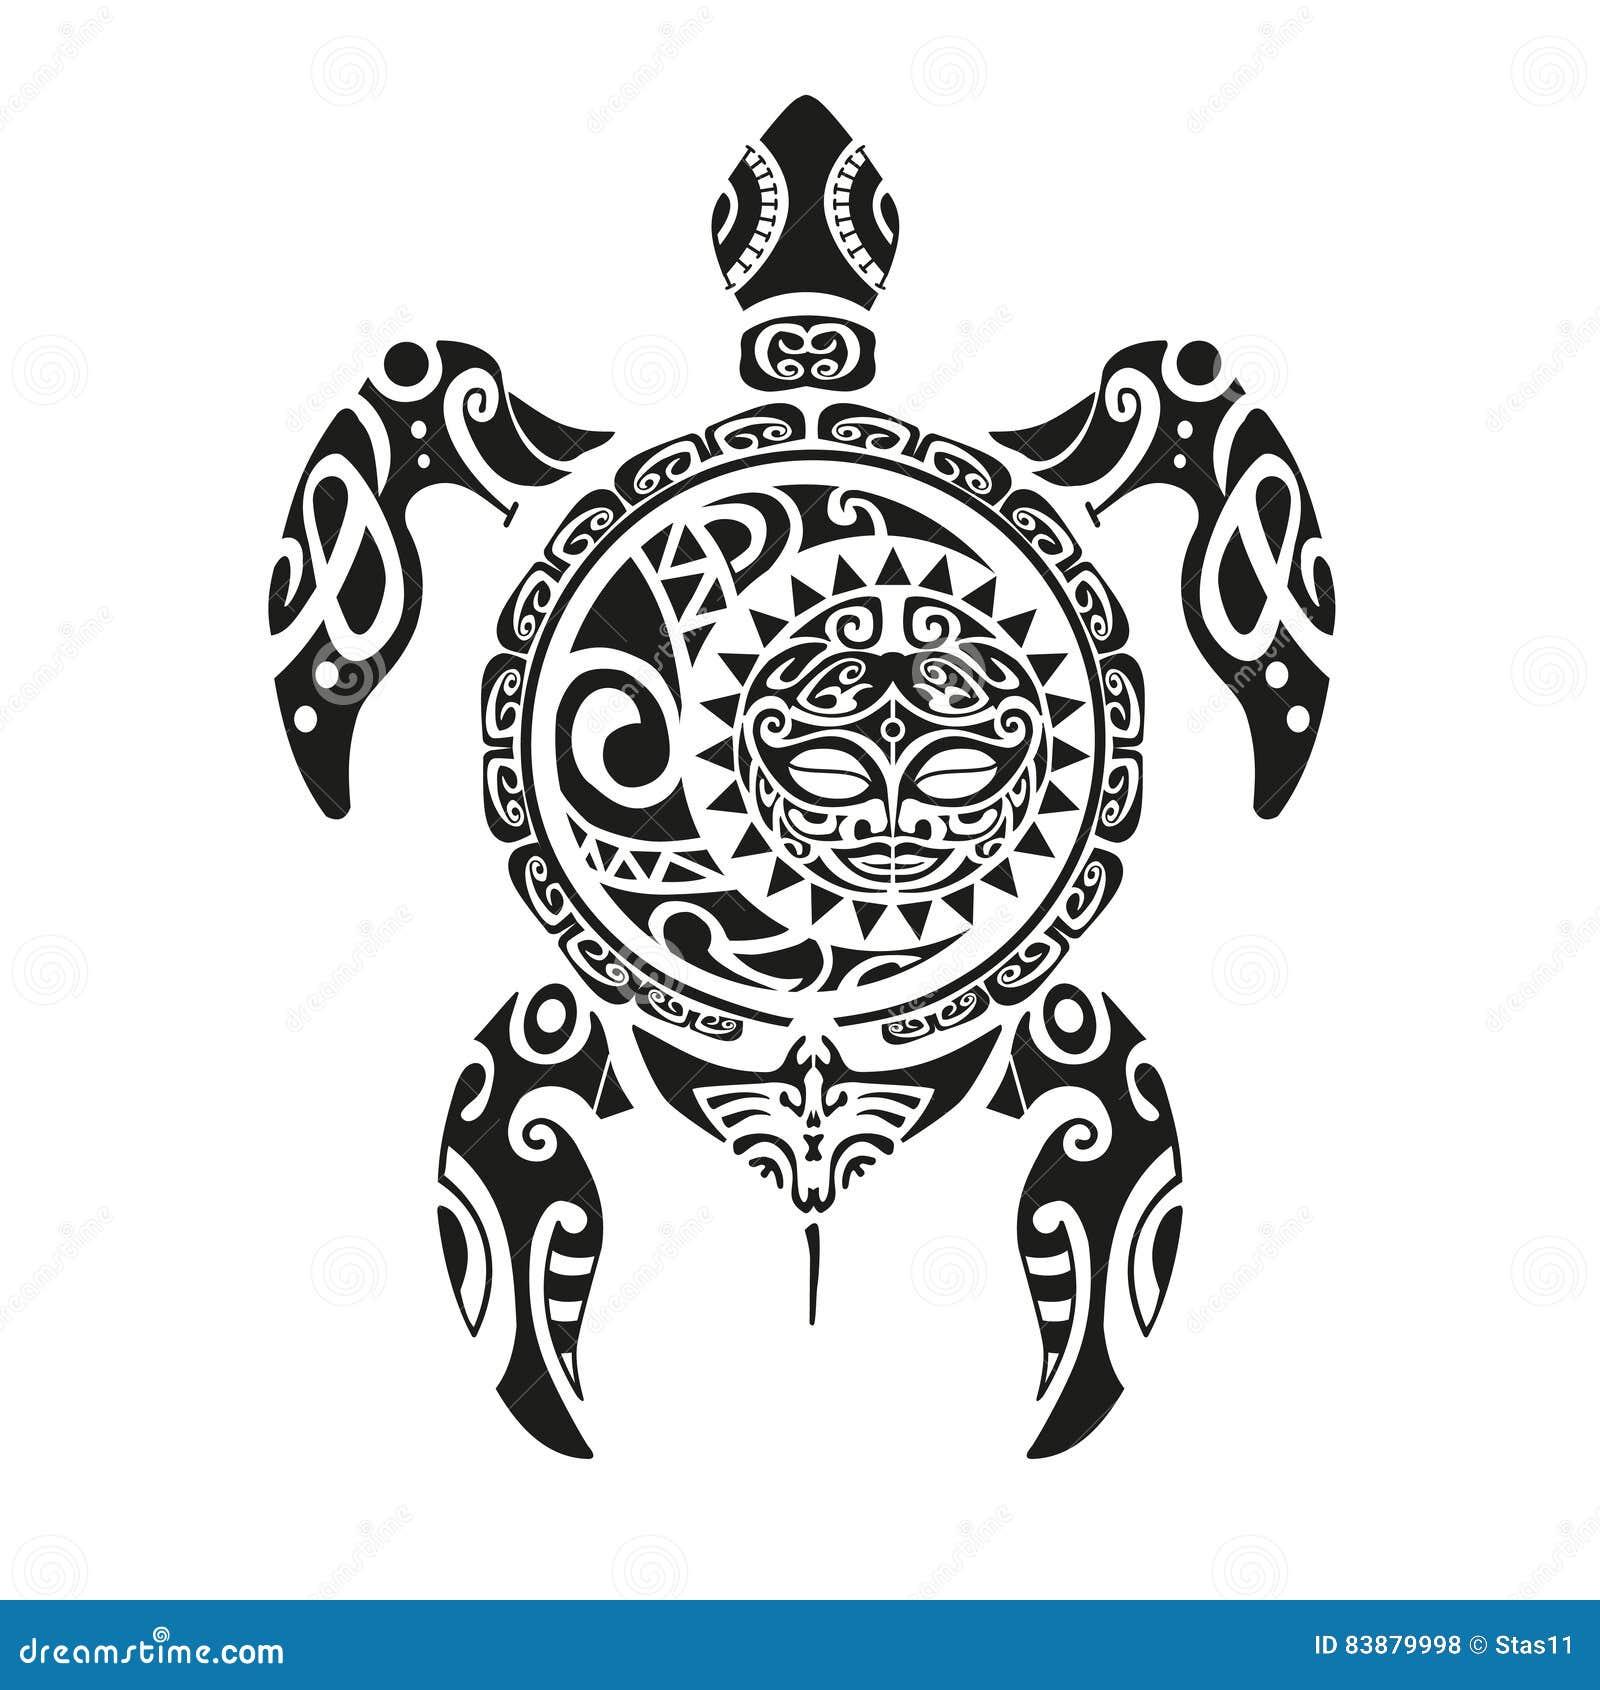 Dibujos Maories Para Tatuar Awesome Significado De Los Simbolos - Simbolos-maories